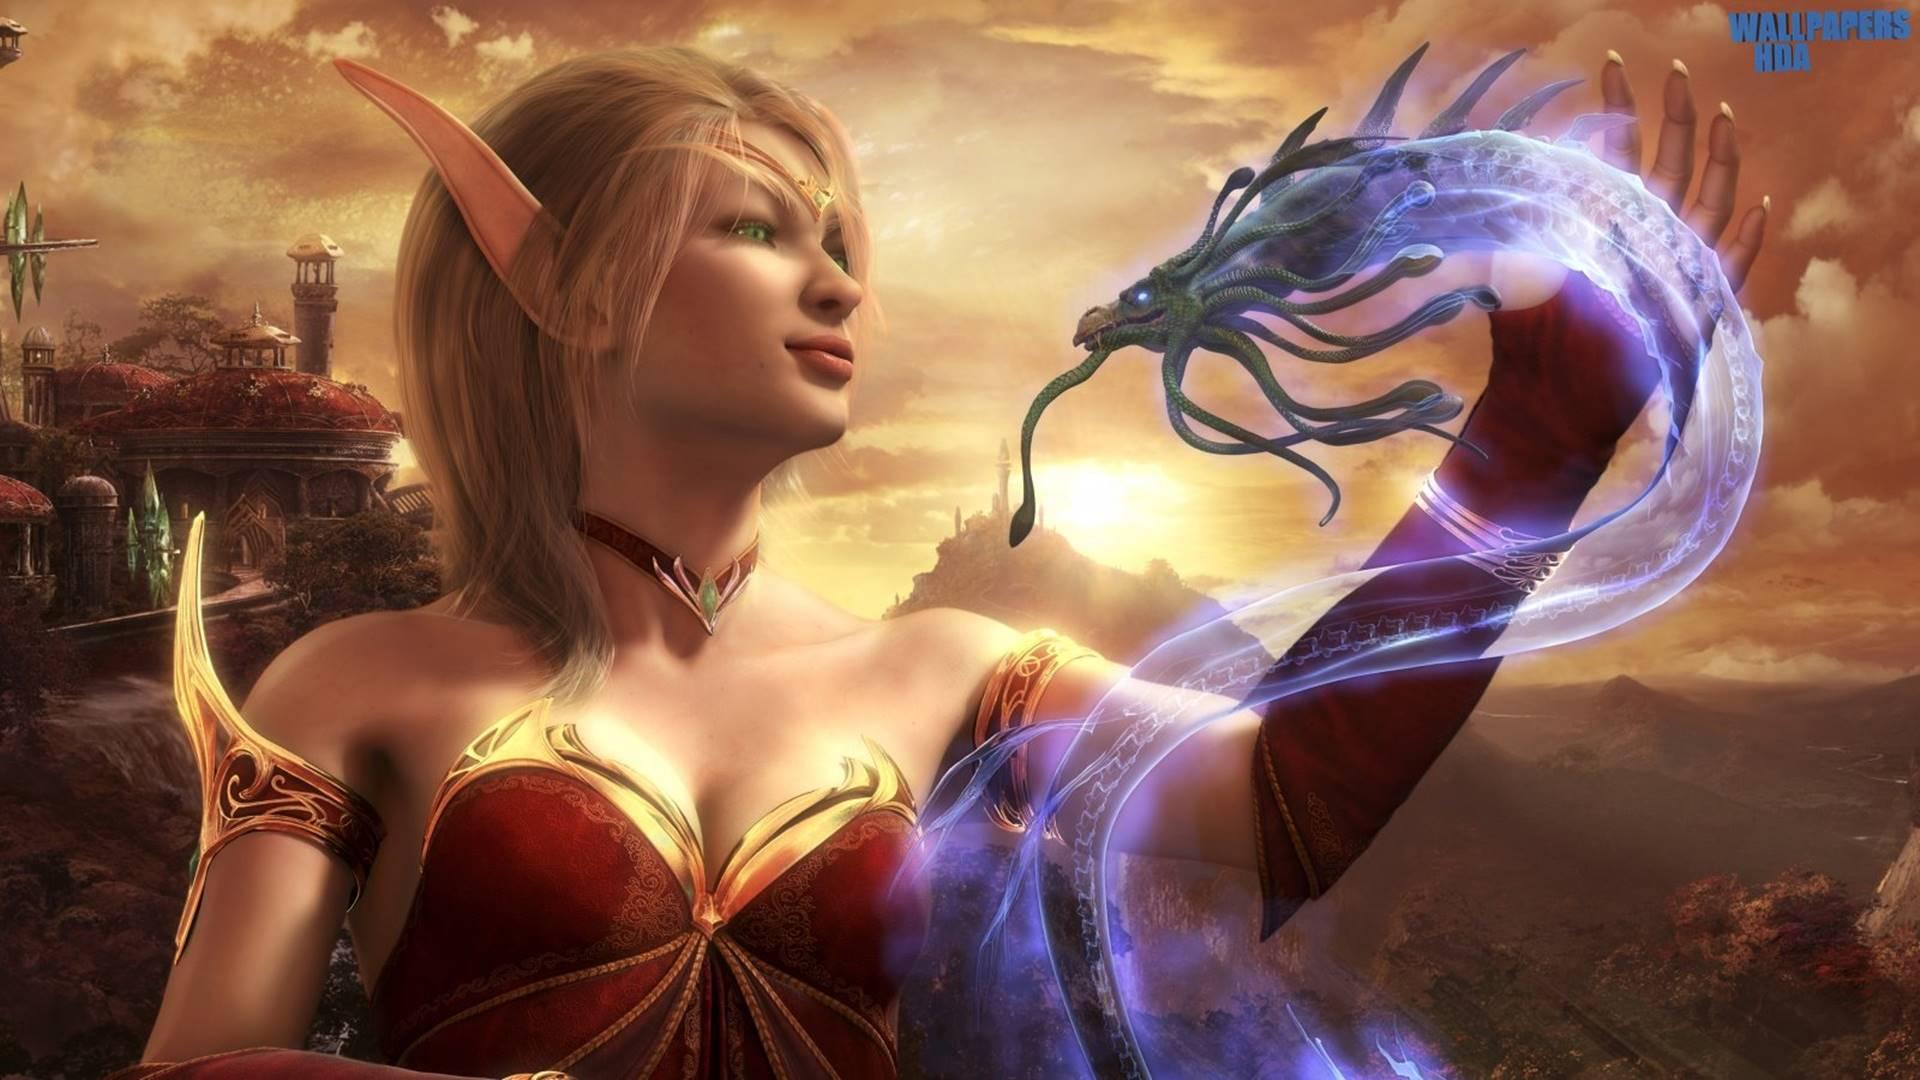 Wolfenstein Hd Wallpapers Blood Elf World Of Warcraft 1920 215 1080 Wallpaper 2017 Hd